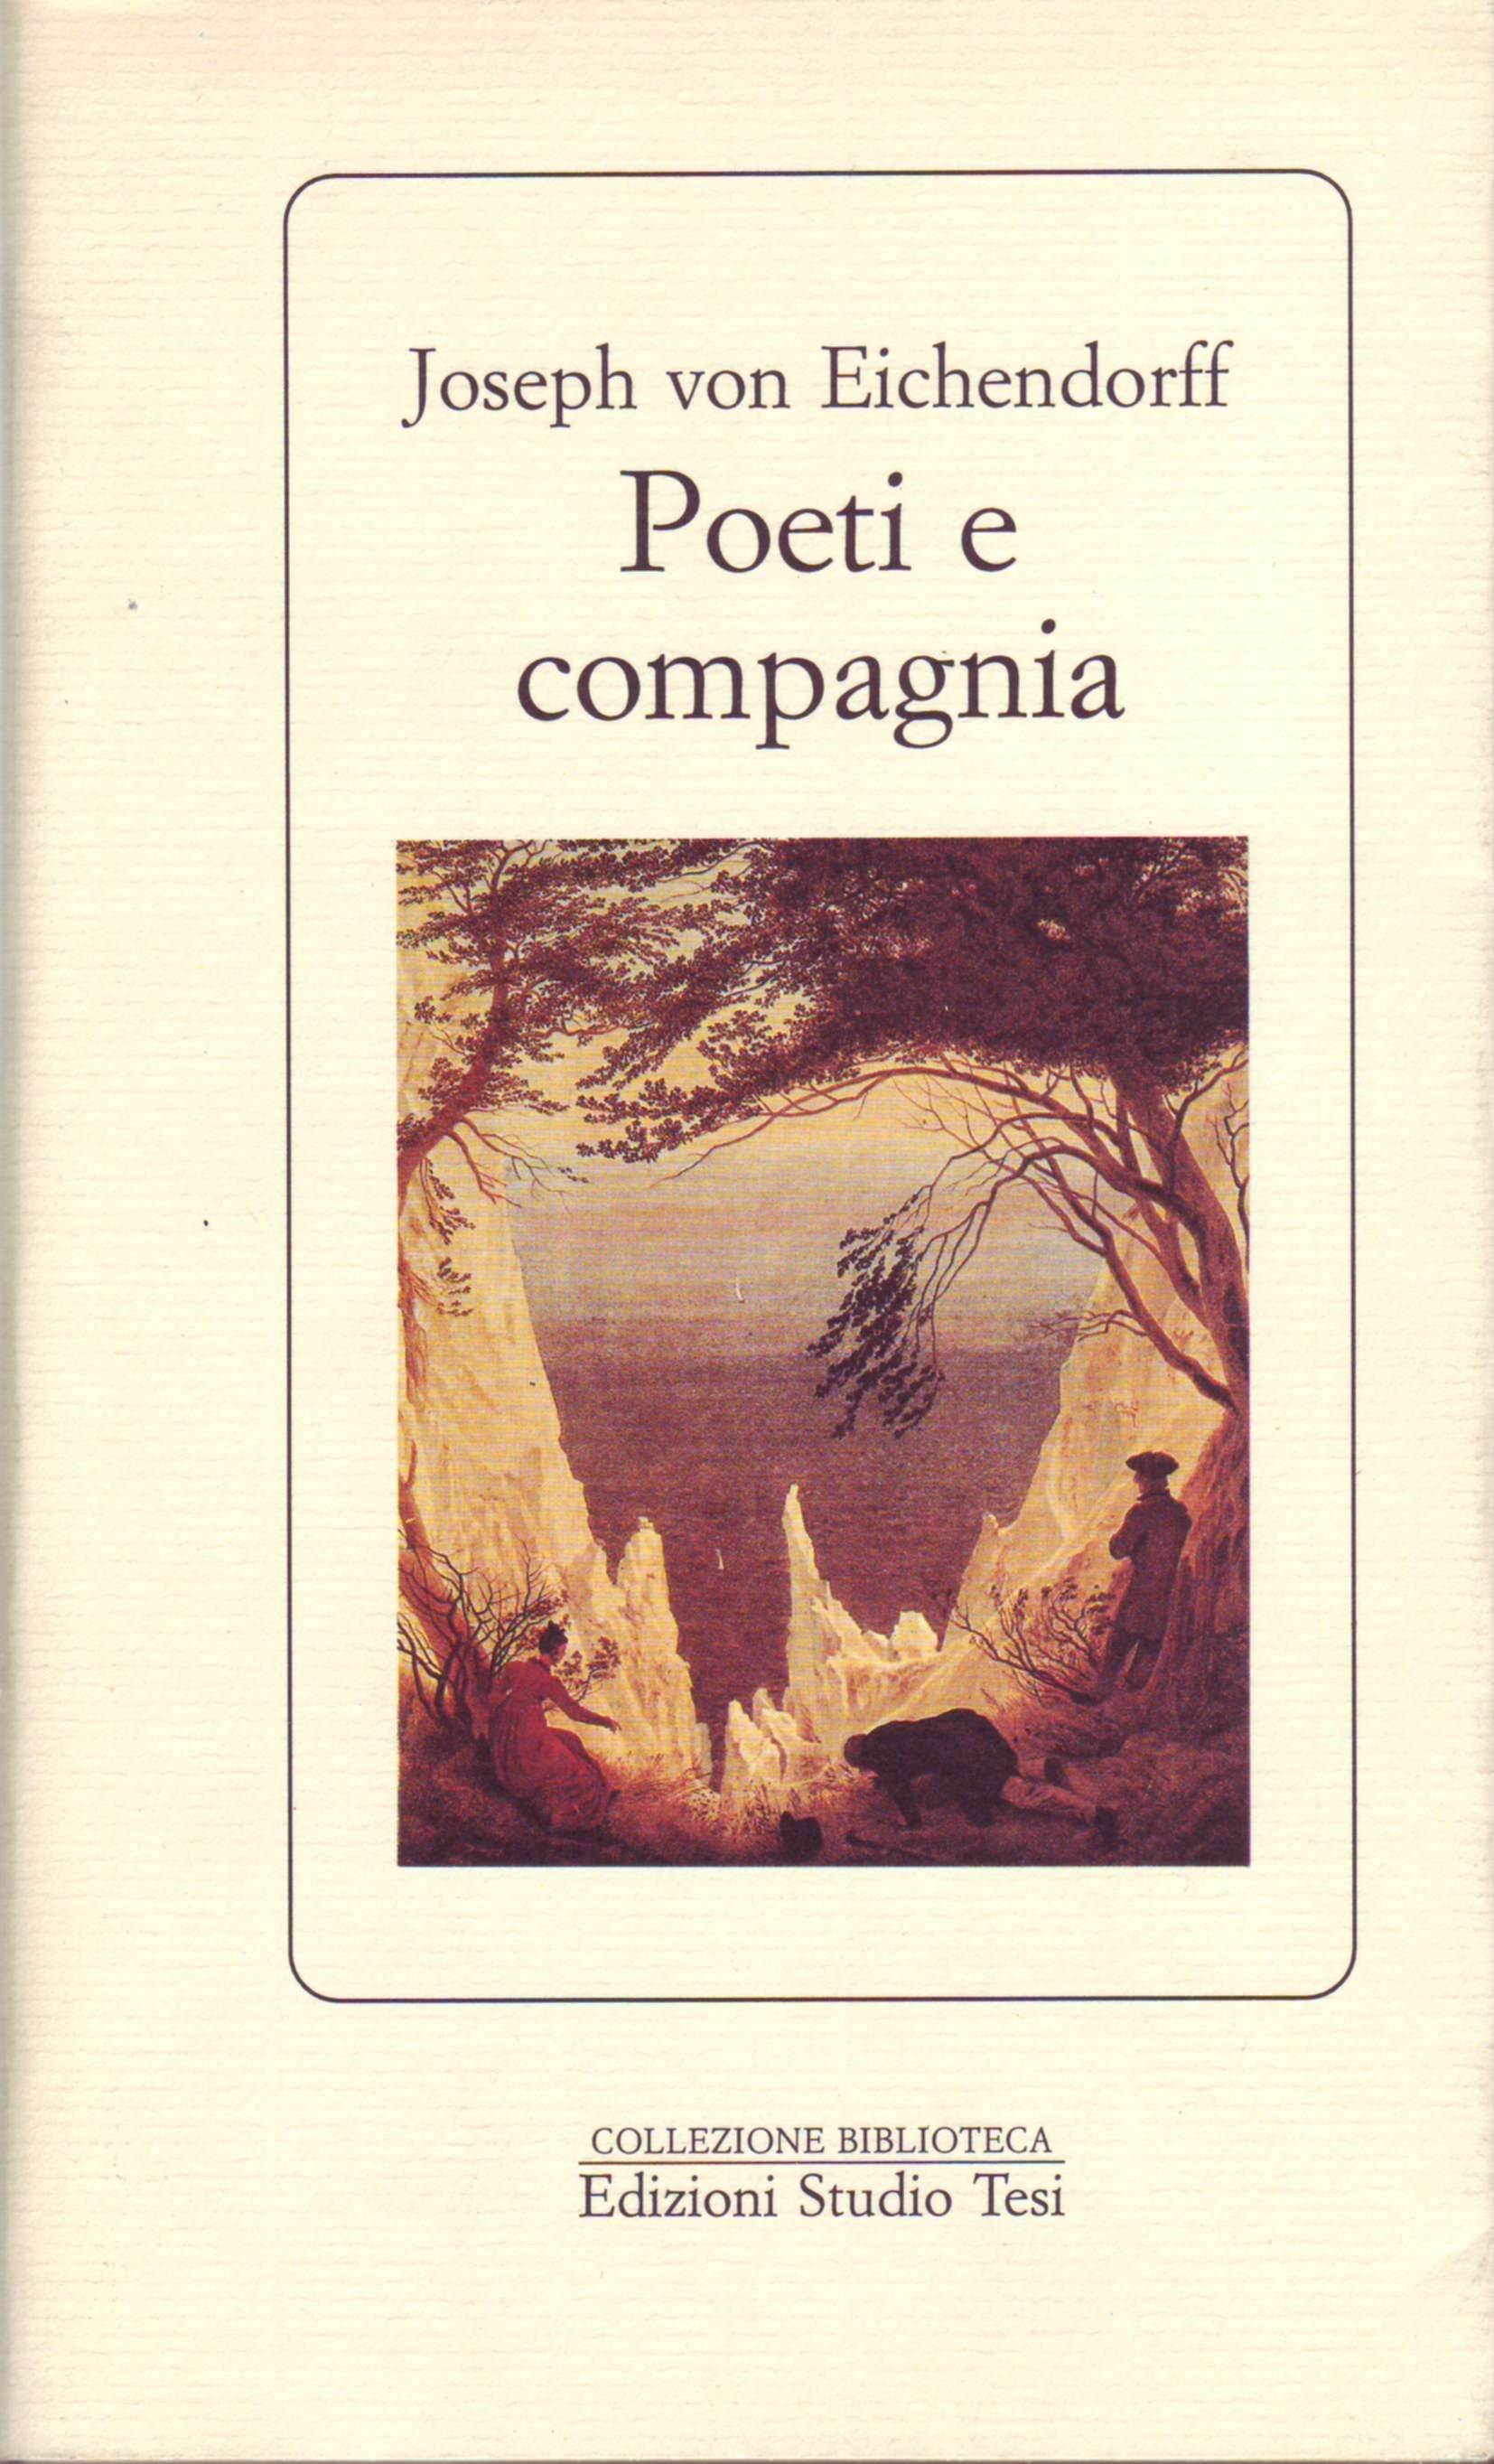 Poeti e compagnia